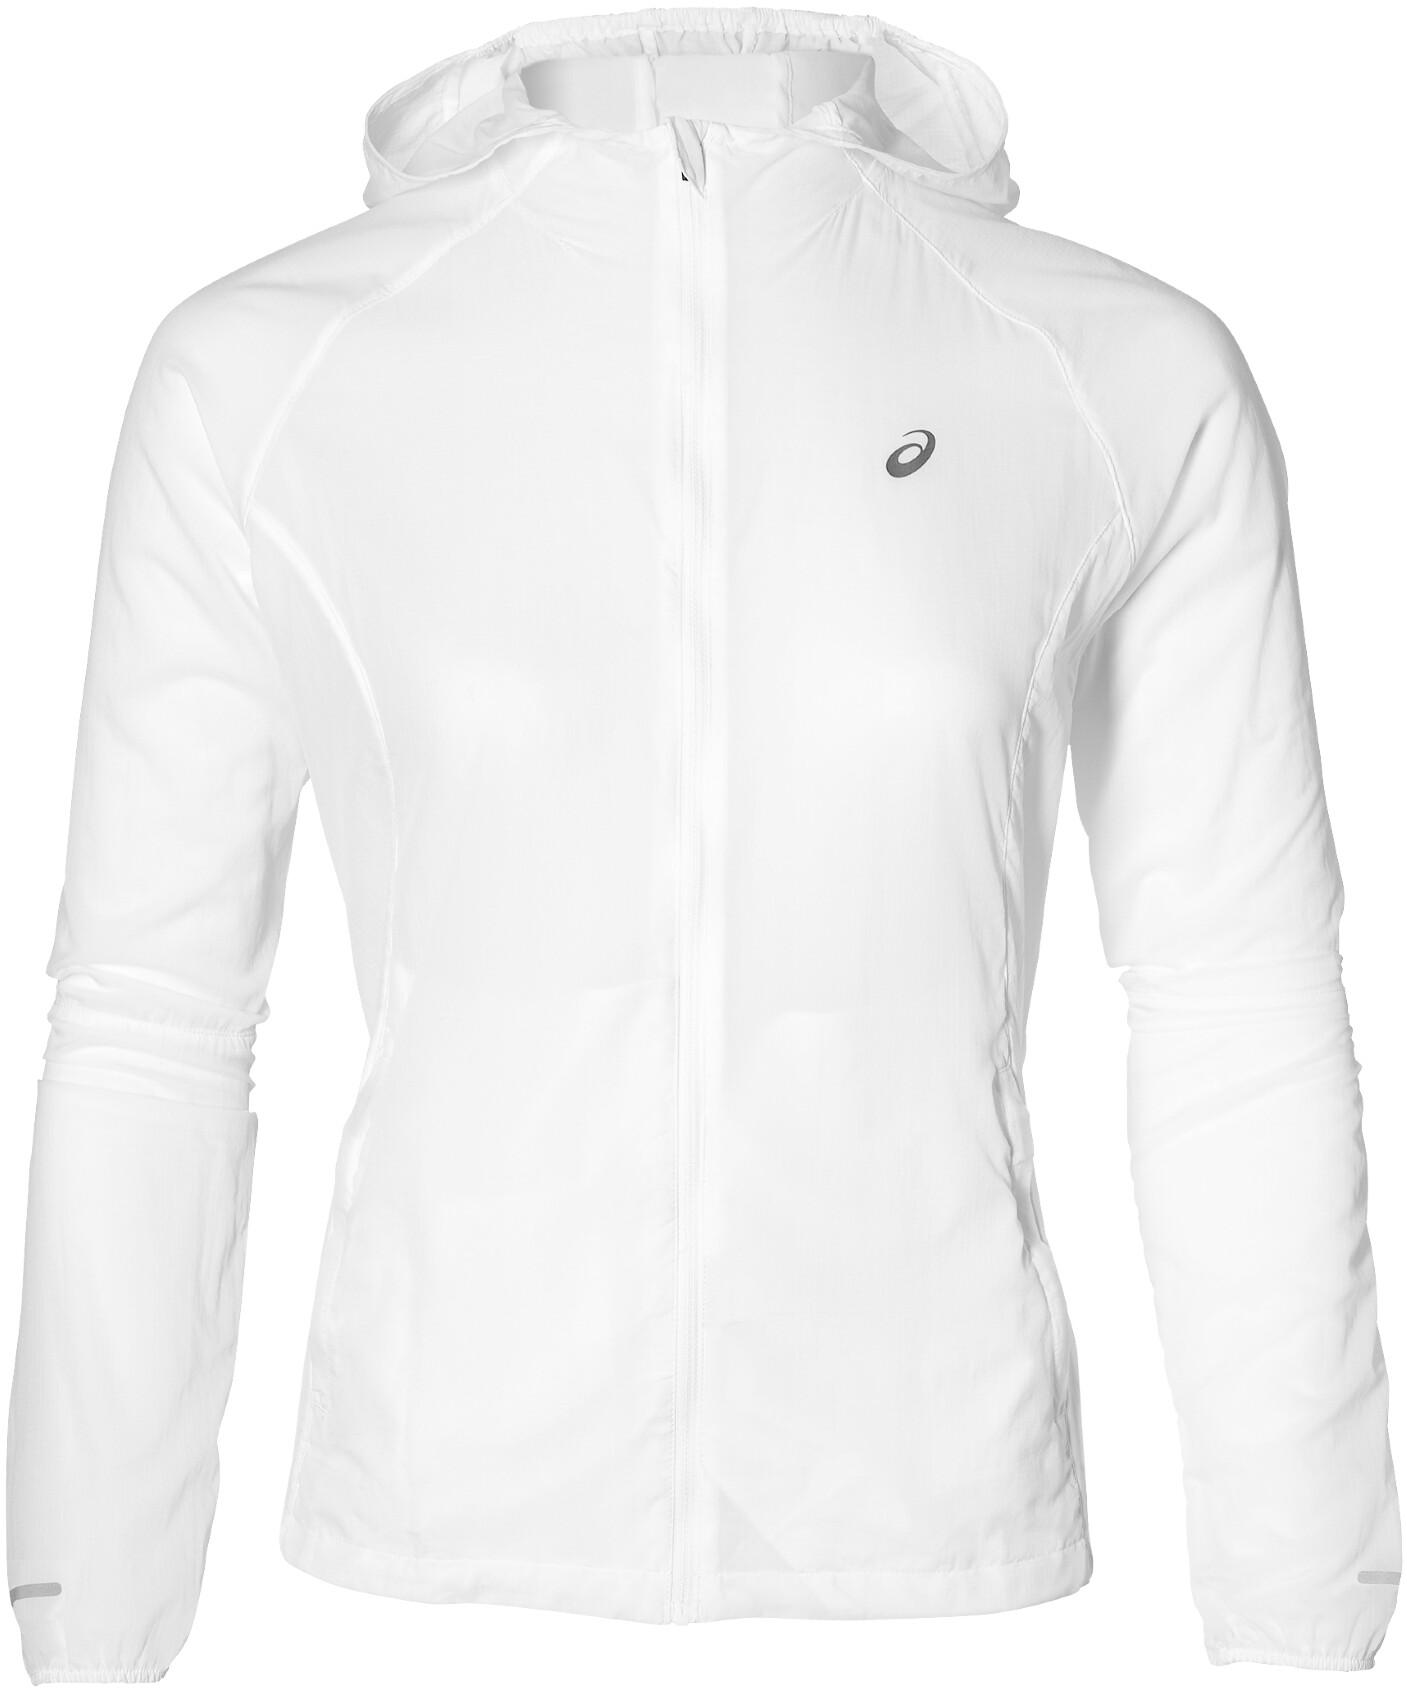 8da0c7919bf asics Packable - Chaqueta Running Mujer - blanco